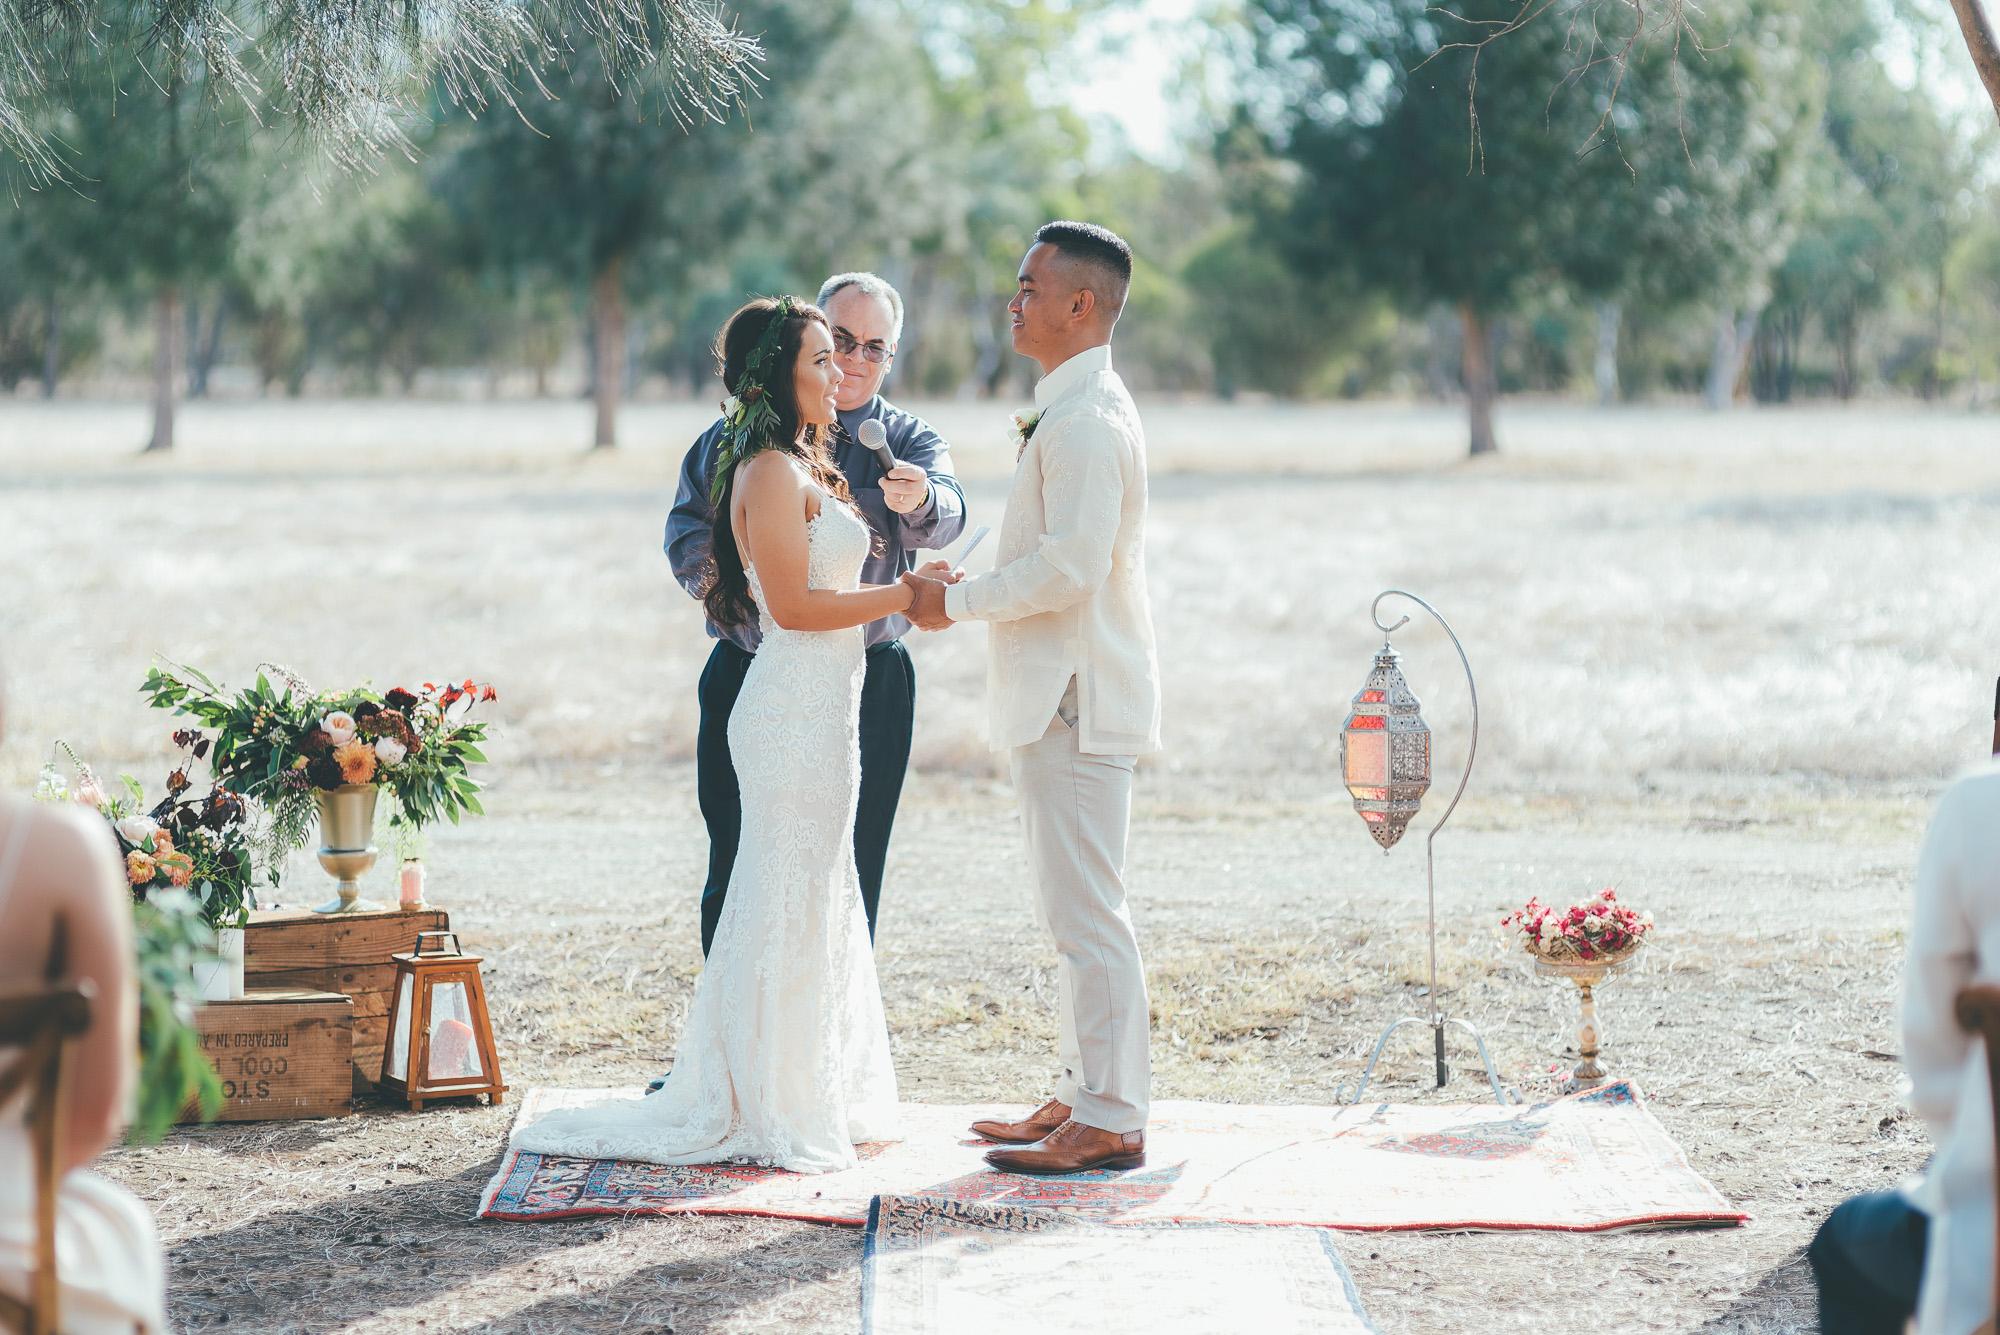 wedding-photographer-outdoor-casual-styled-los-angeles-australia-california-international-earthbound -42.jpg